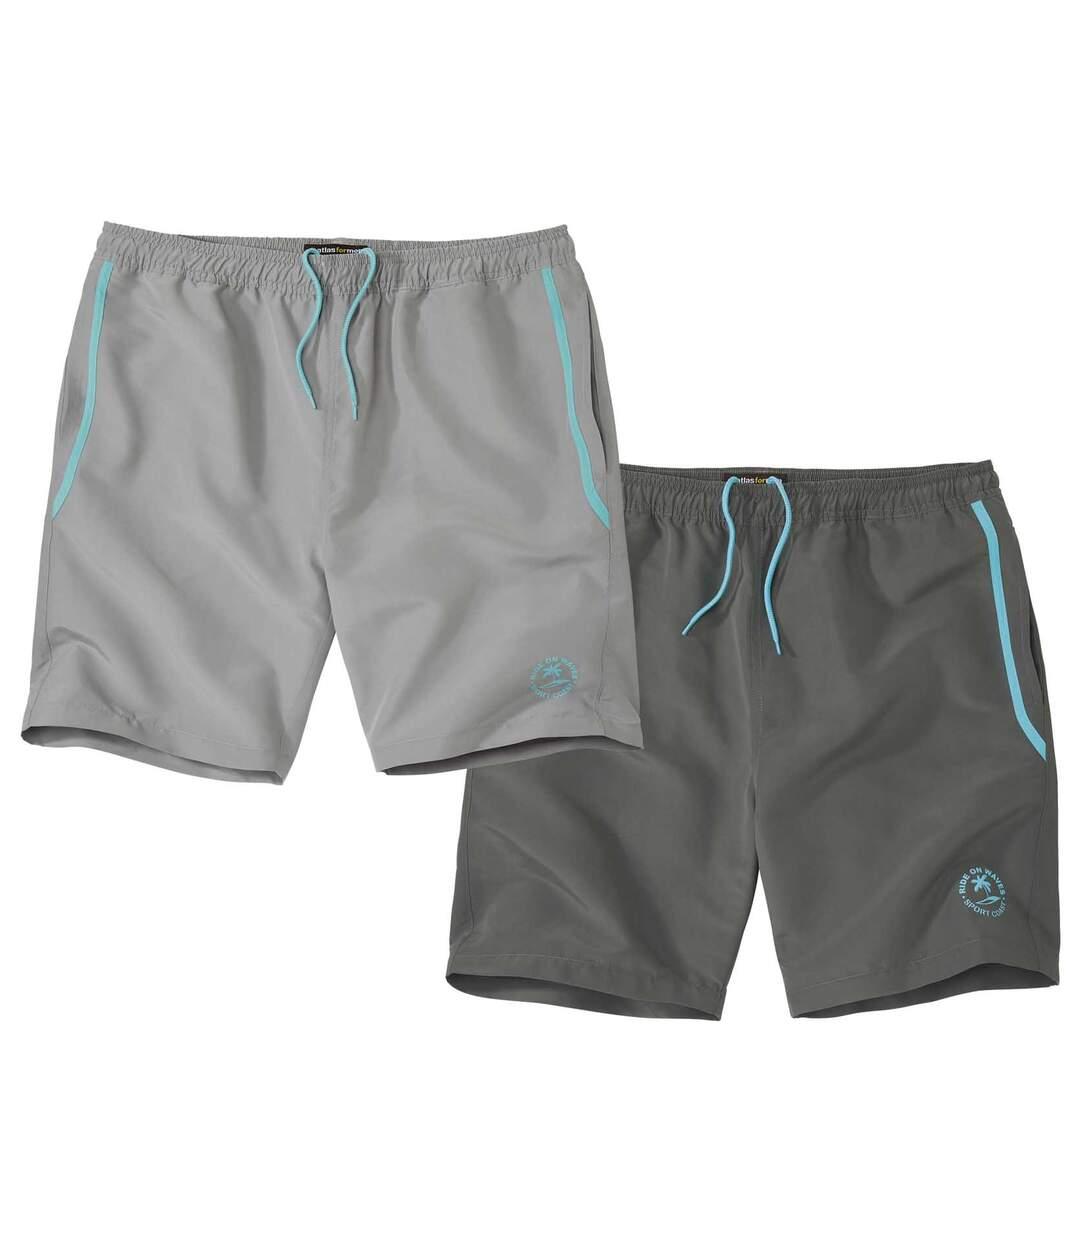 2er-Pack Shorts Sporting aus Microfaser